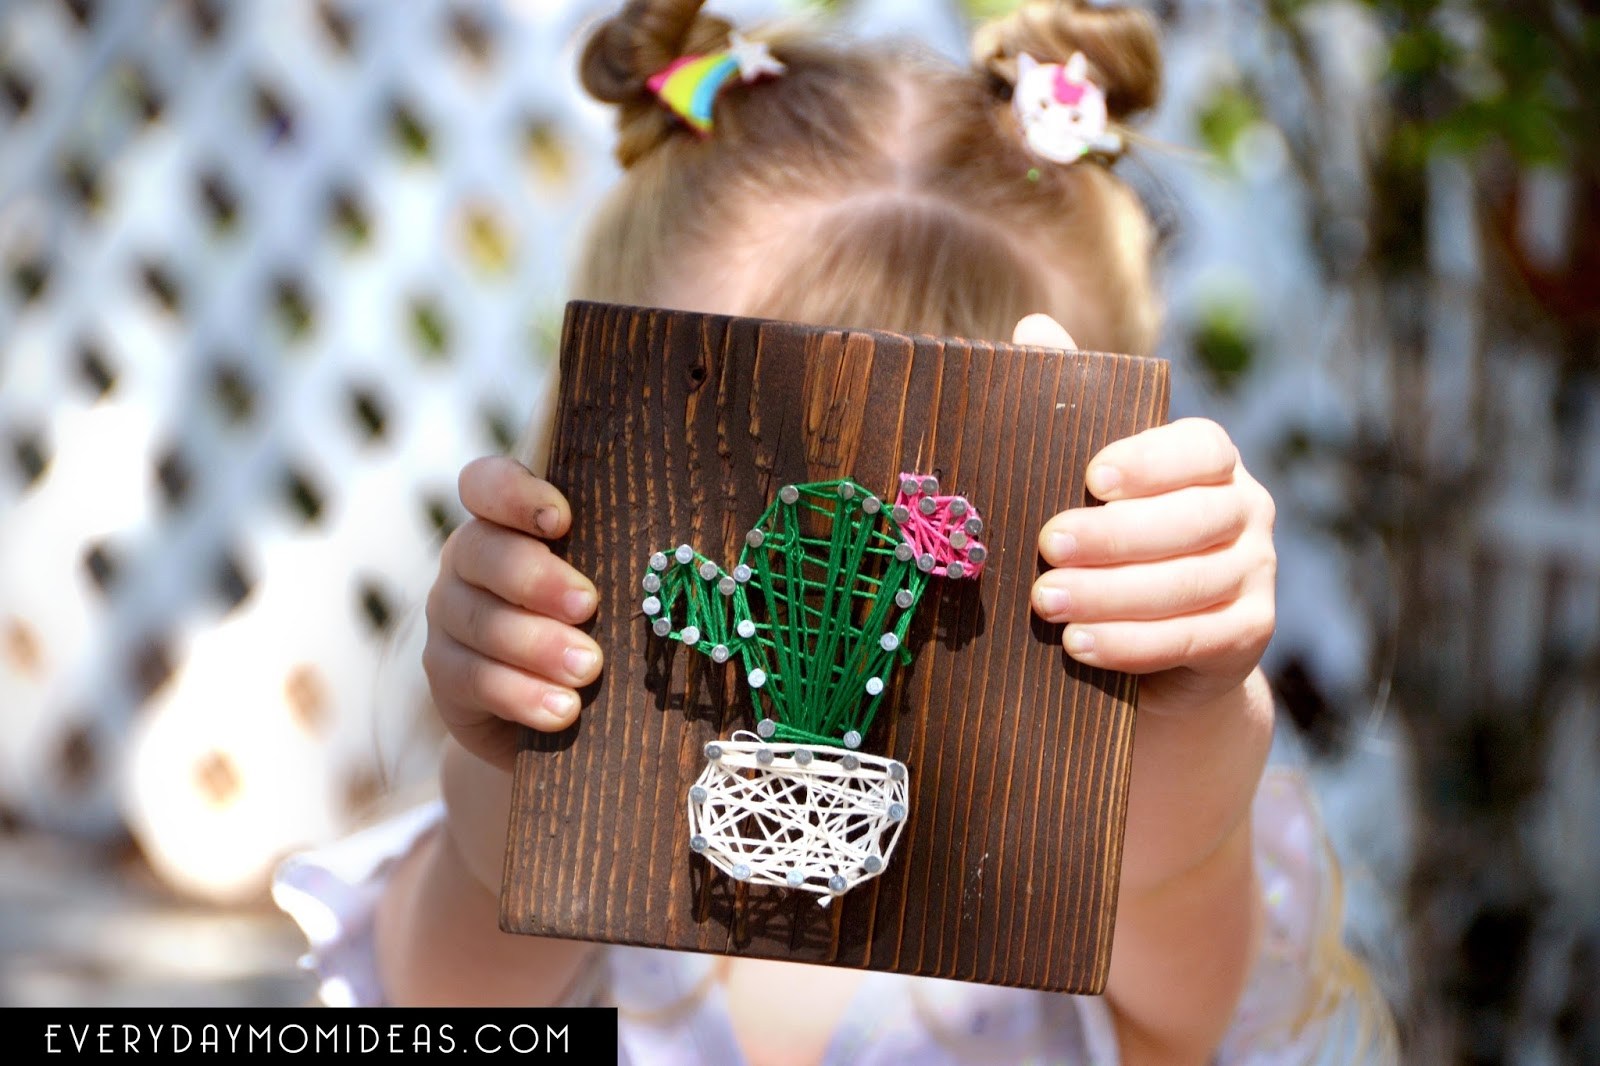 PDF Design DIY String Art Cactus Home Decor Pattern Stencil Cactus String Art Template Cactus